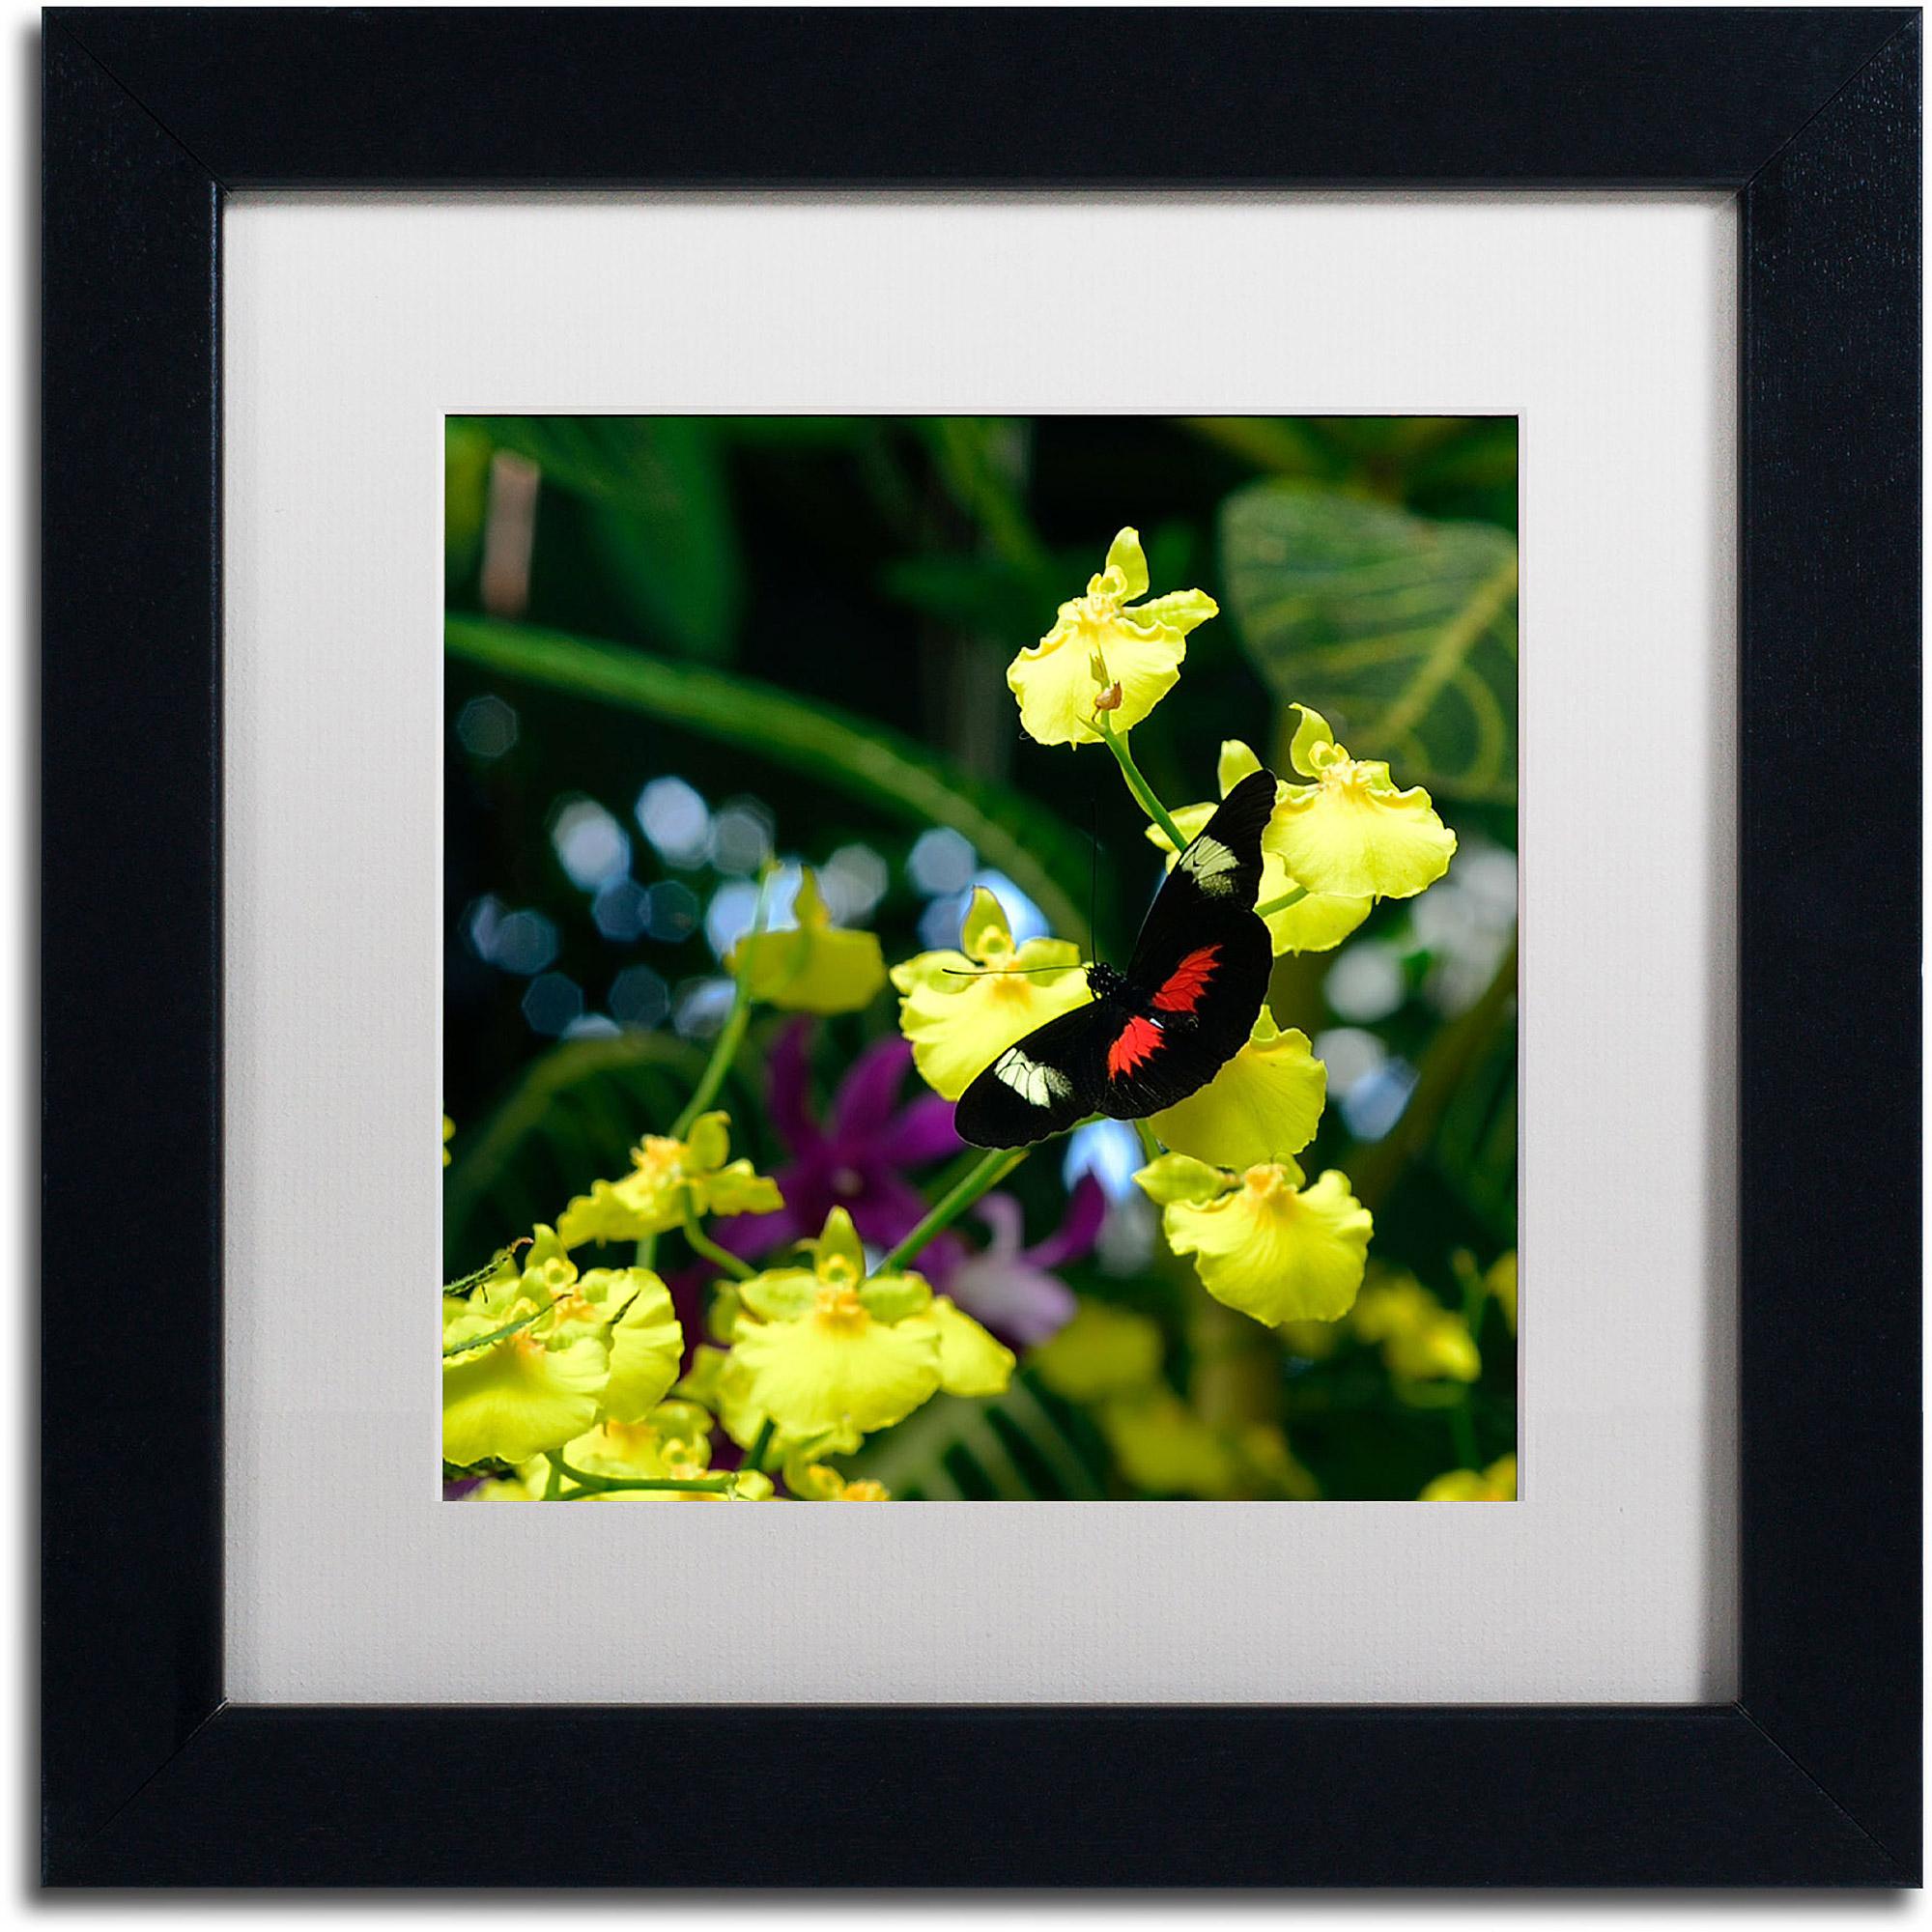 "Trademark Fine Art ""Doris Longwing Butterfly on Orchid"" Canvas Art by Kurt Shaffer, White Matte, Black Frame"